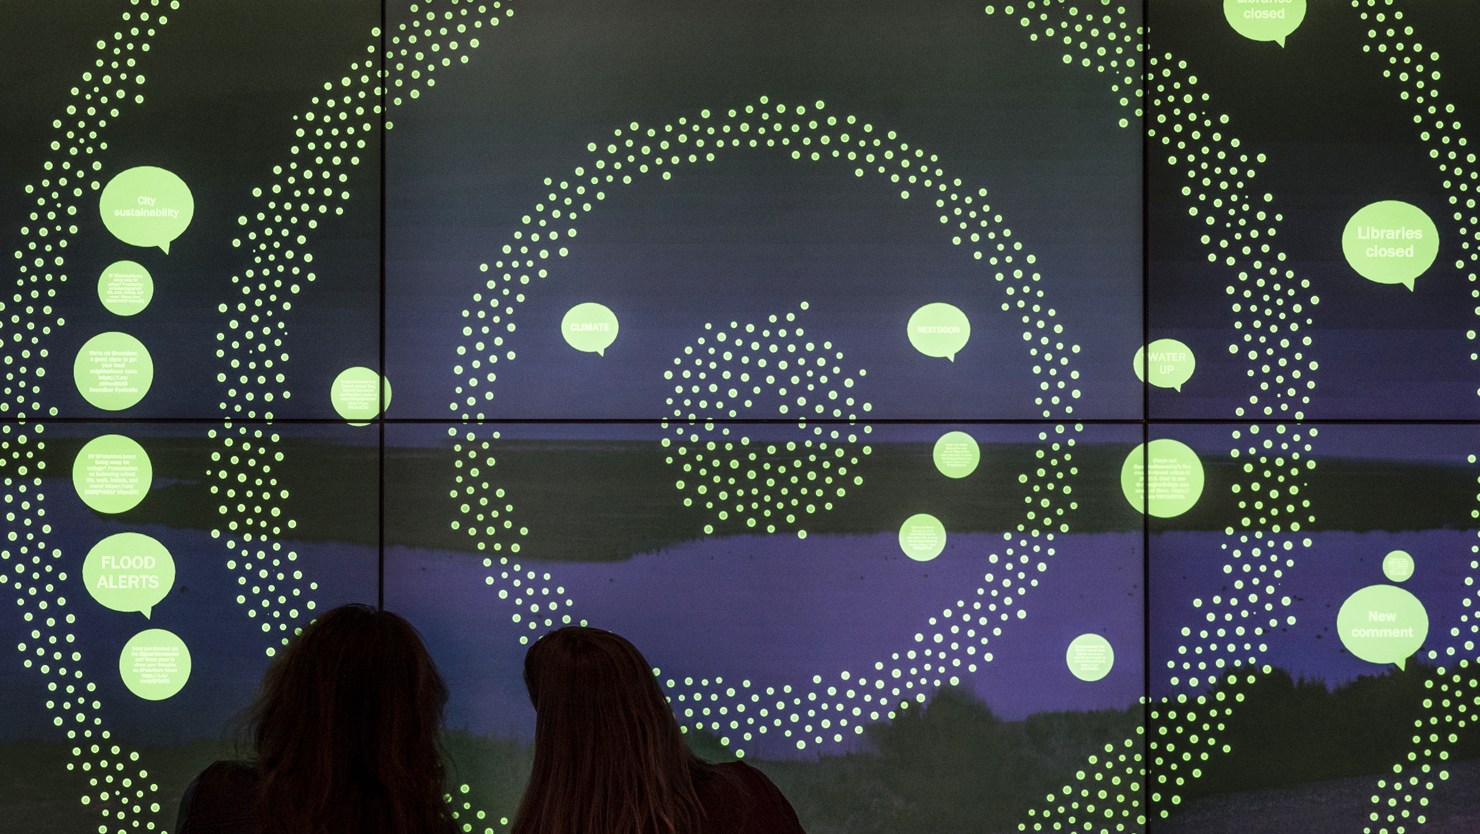 interactive-media-wall-3